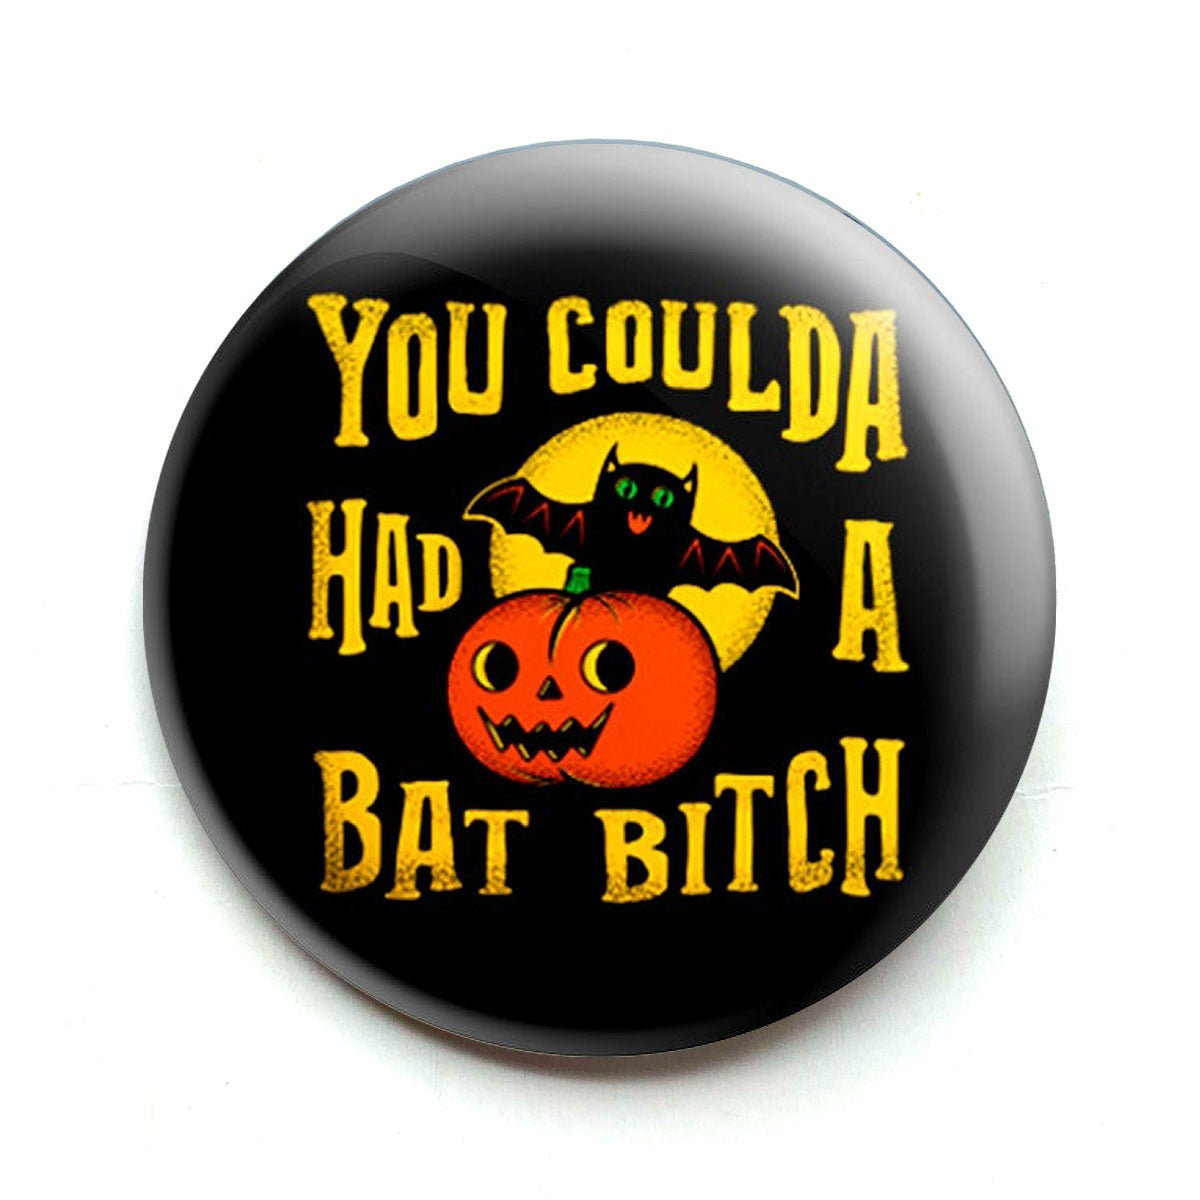 Image of Bat Bitch Bottle Opener/ Button/ Magnet